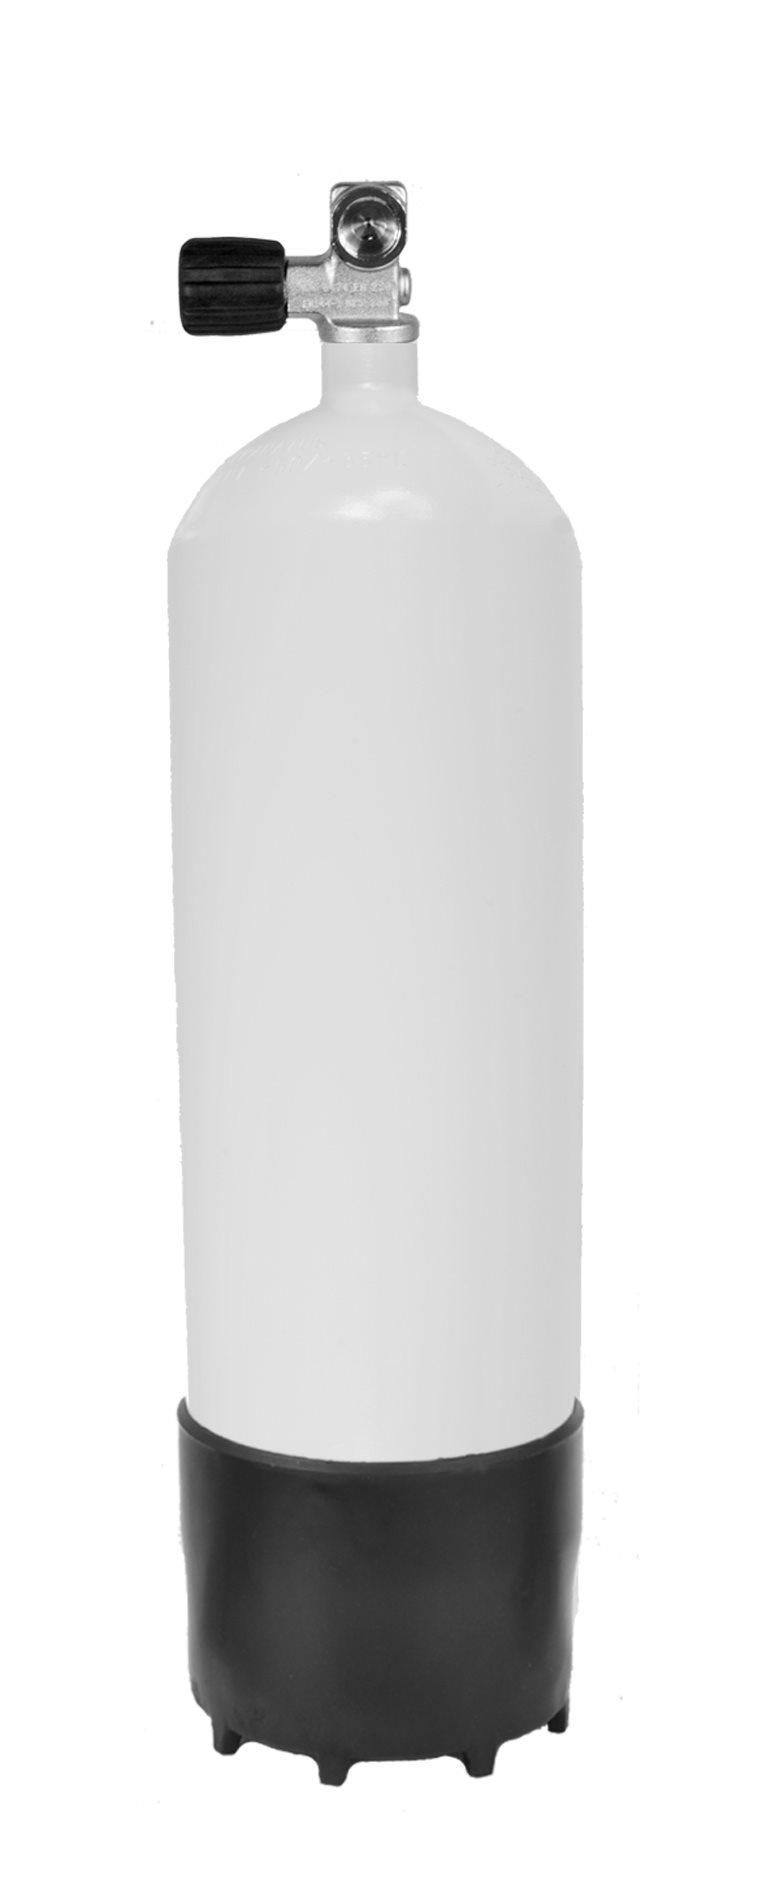 Водолазна бутилка 7 л / 300 бара - Eurocylinder